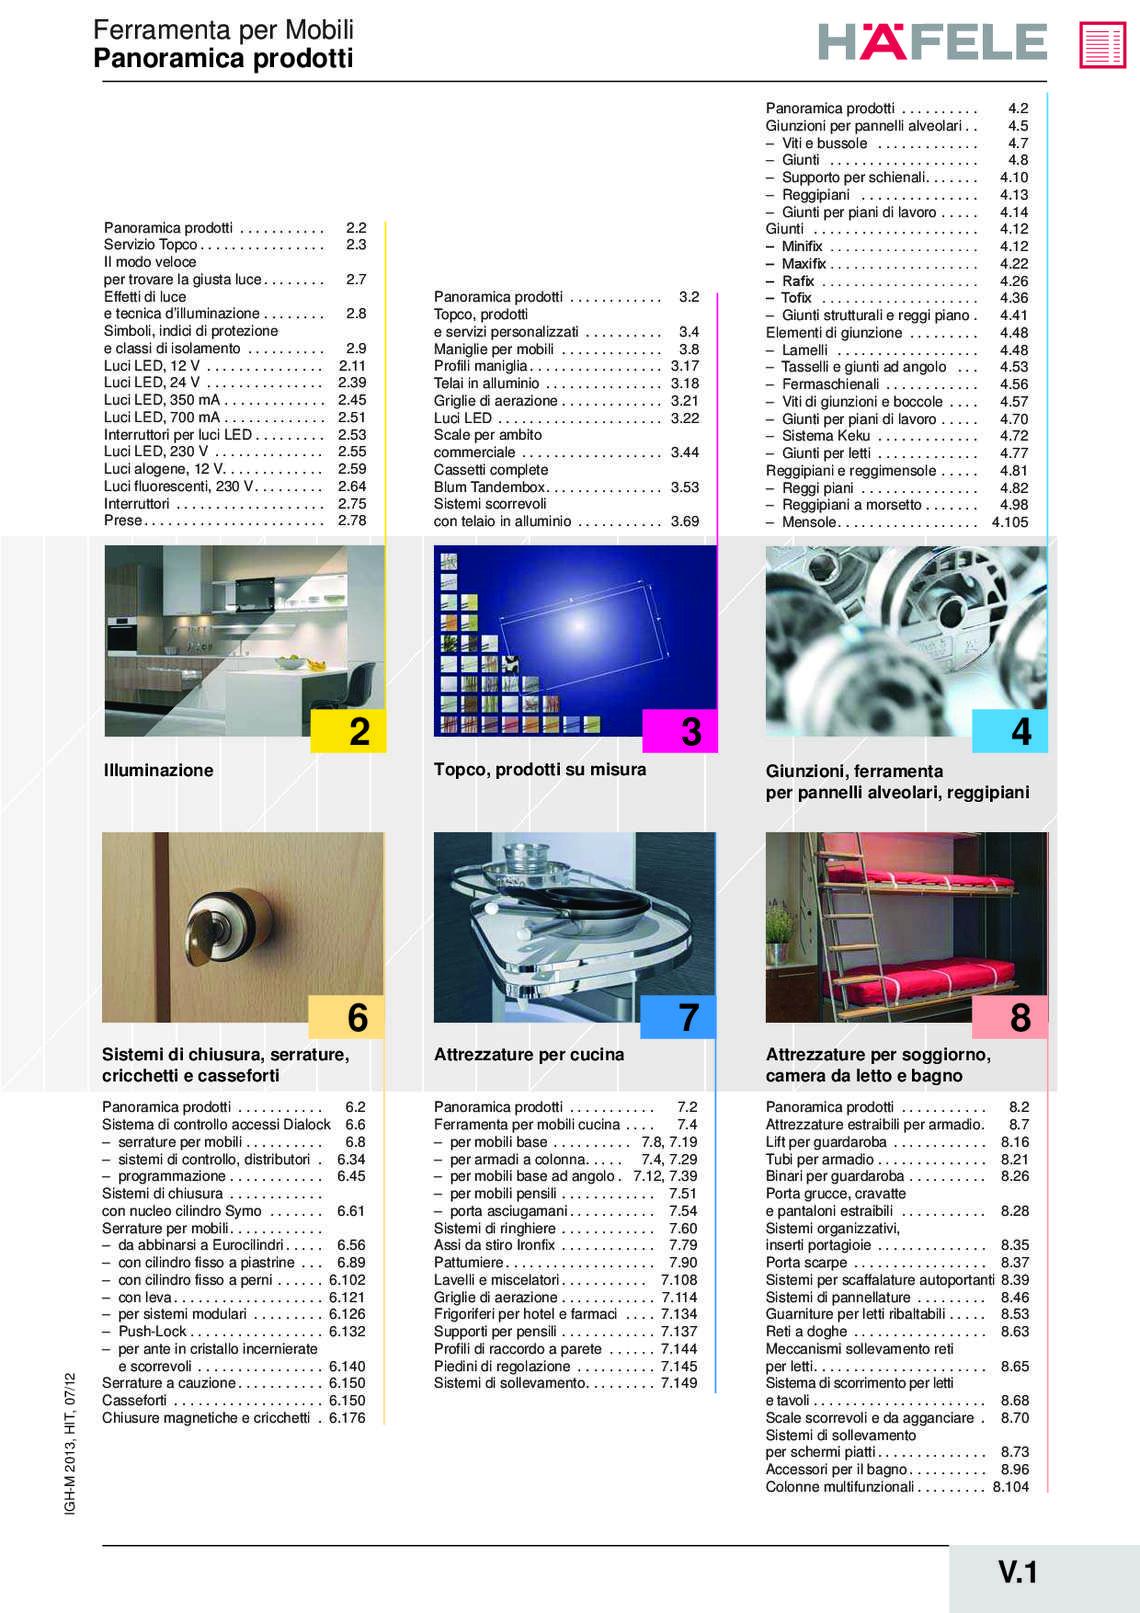 hafele-spondine-e-guide-per-mobili_40_002.jpg